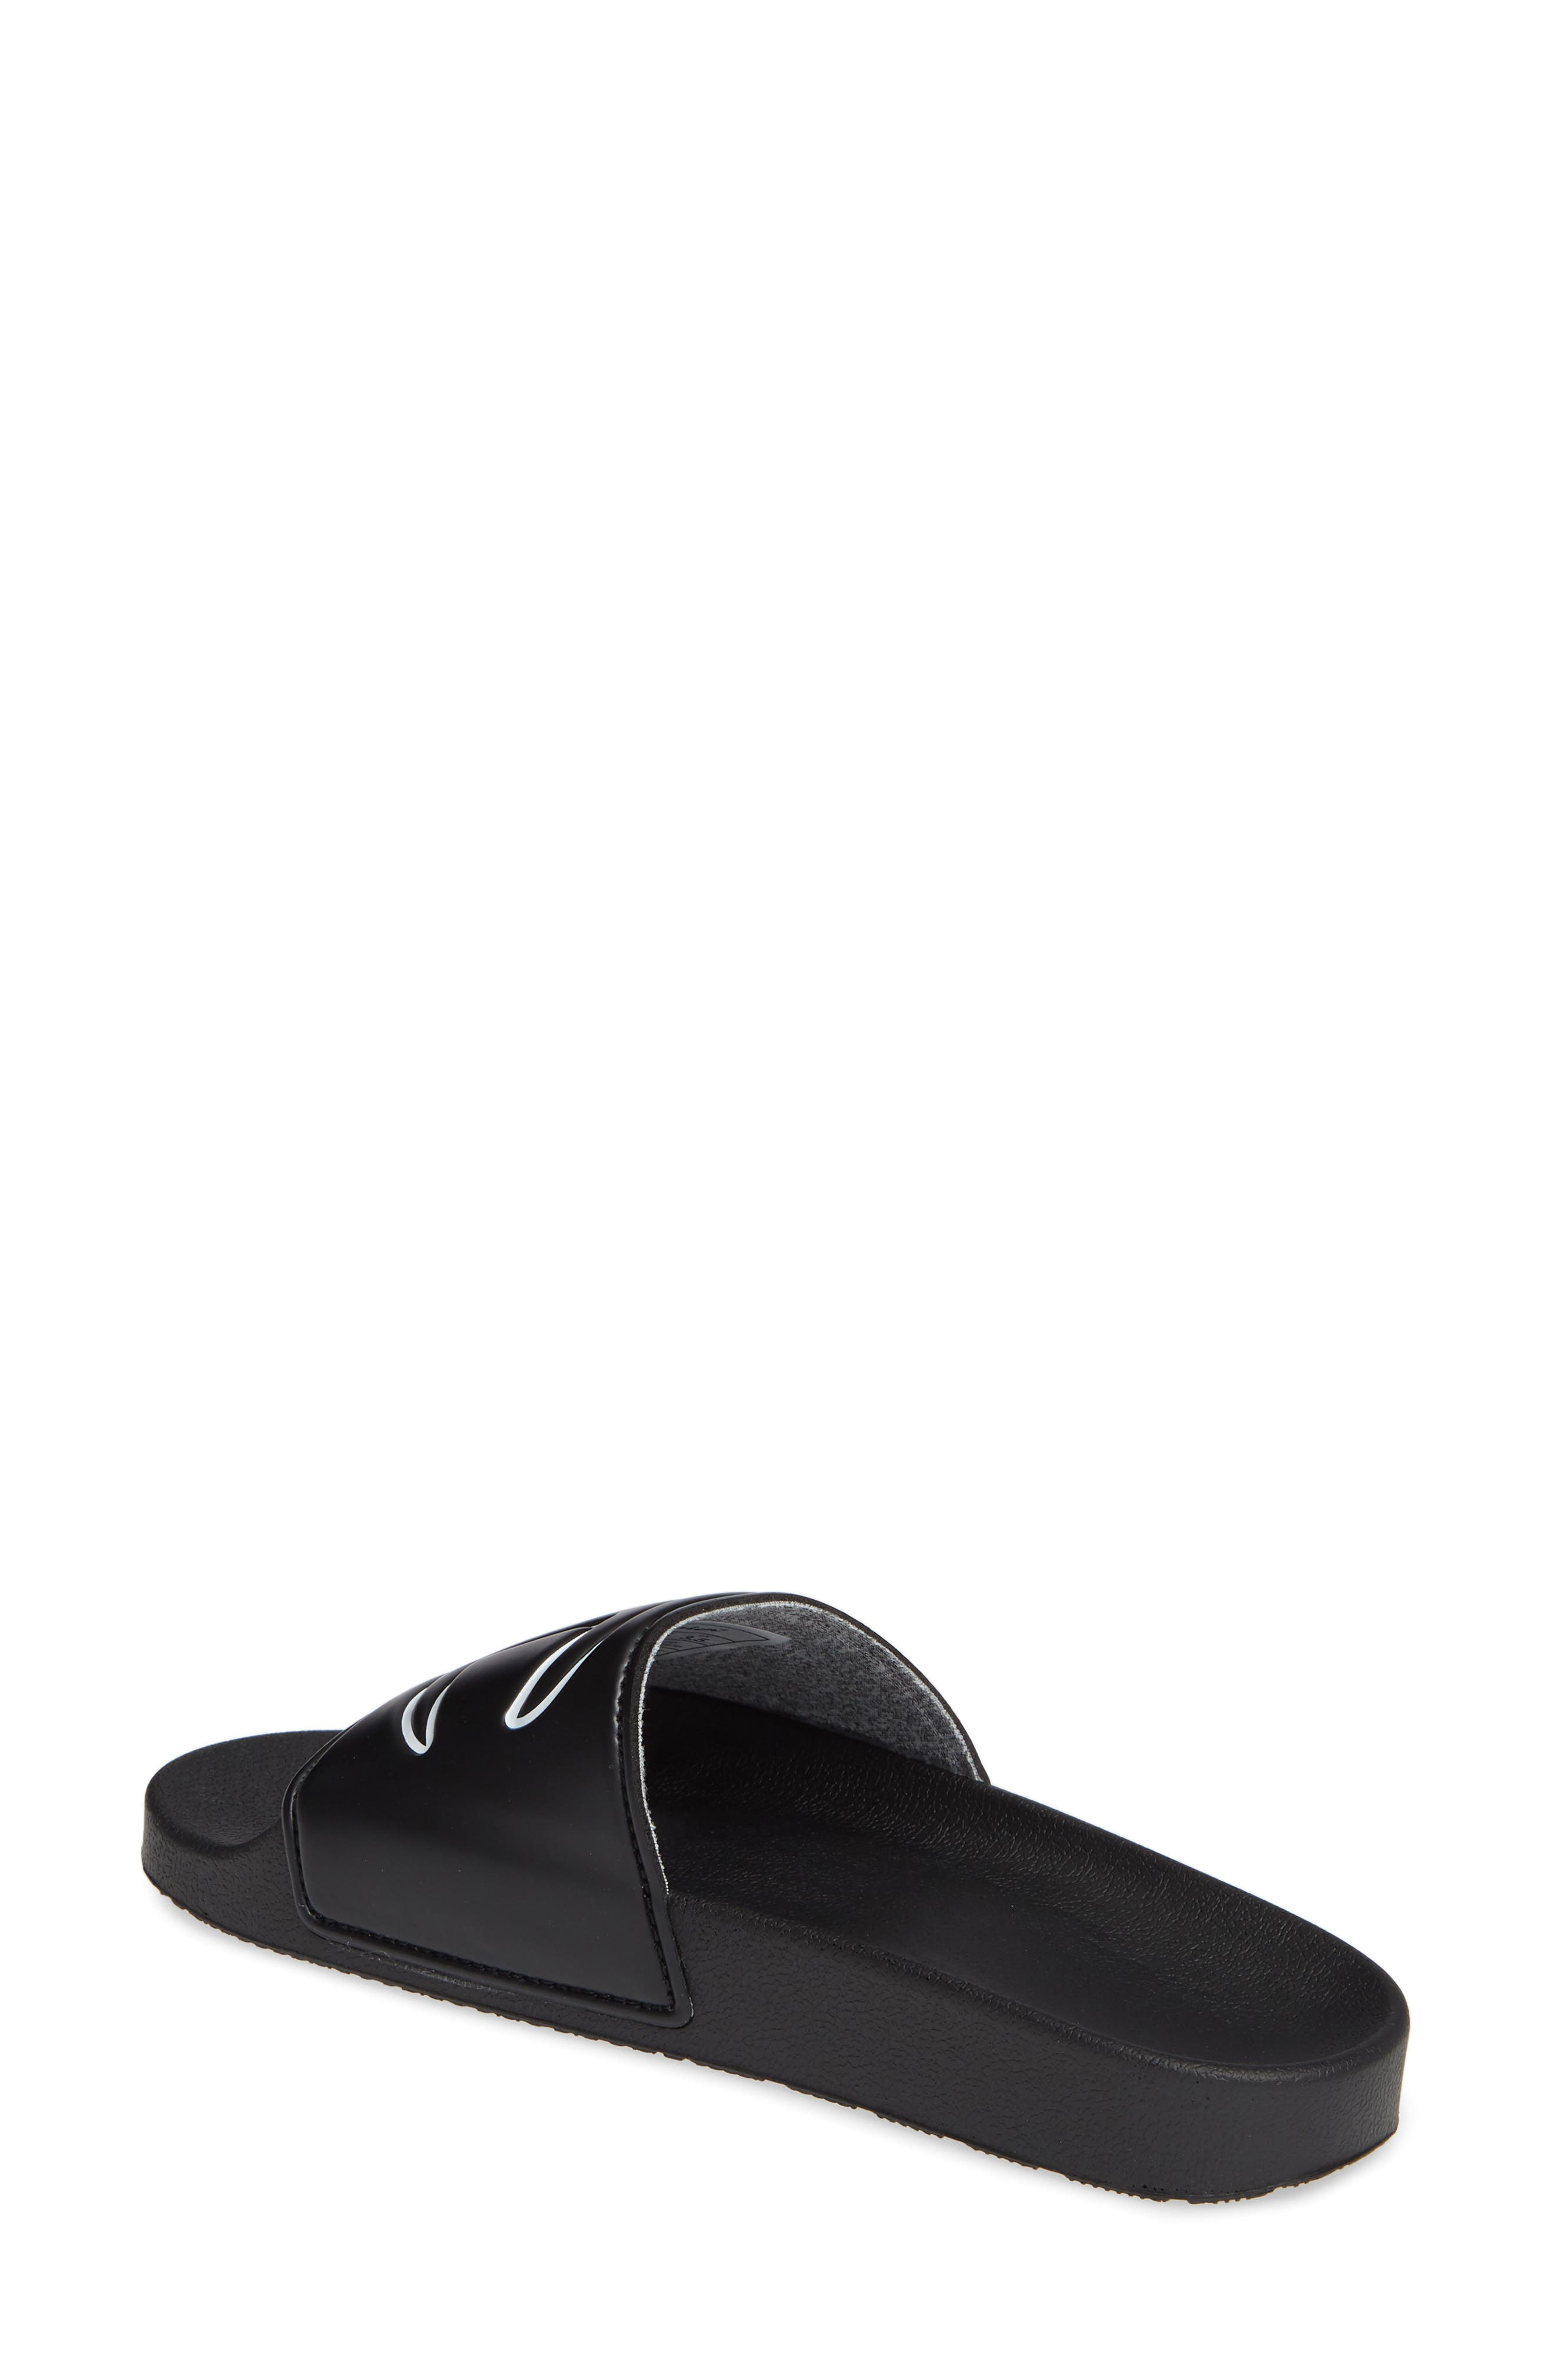 CHAMPION, Slide Sandal, Alternate thumbnail 2, color, BLACK